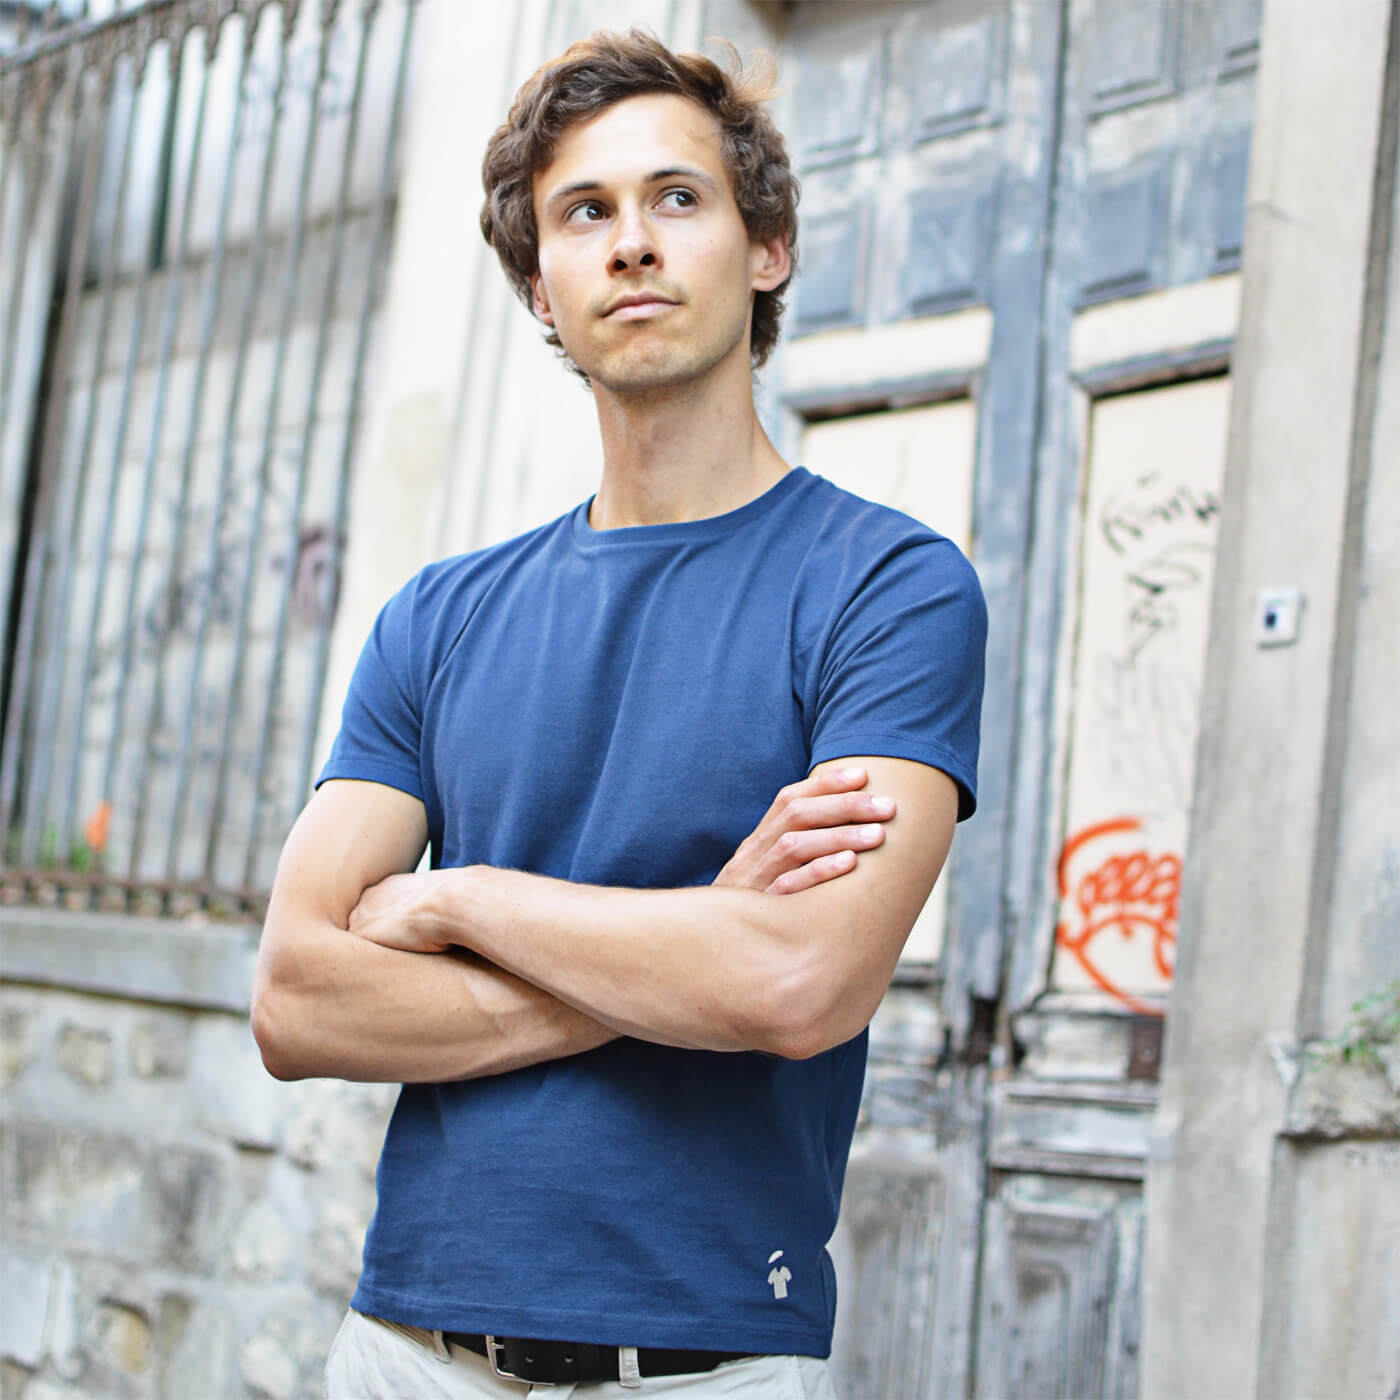 579d09ad0 ... GoudronBlanc · T-shirt bleu minéral - Guerric de Ternay ...